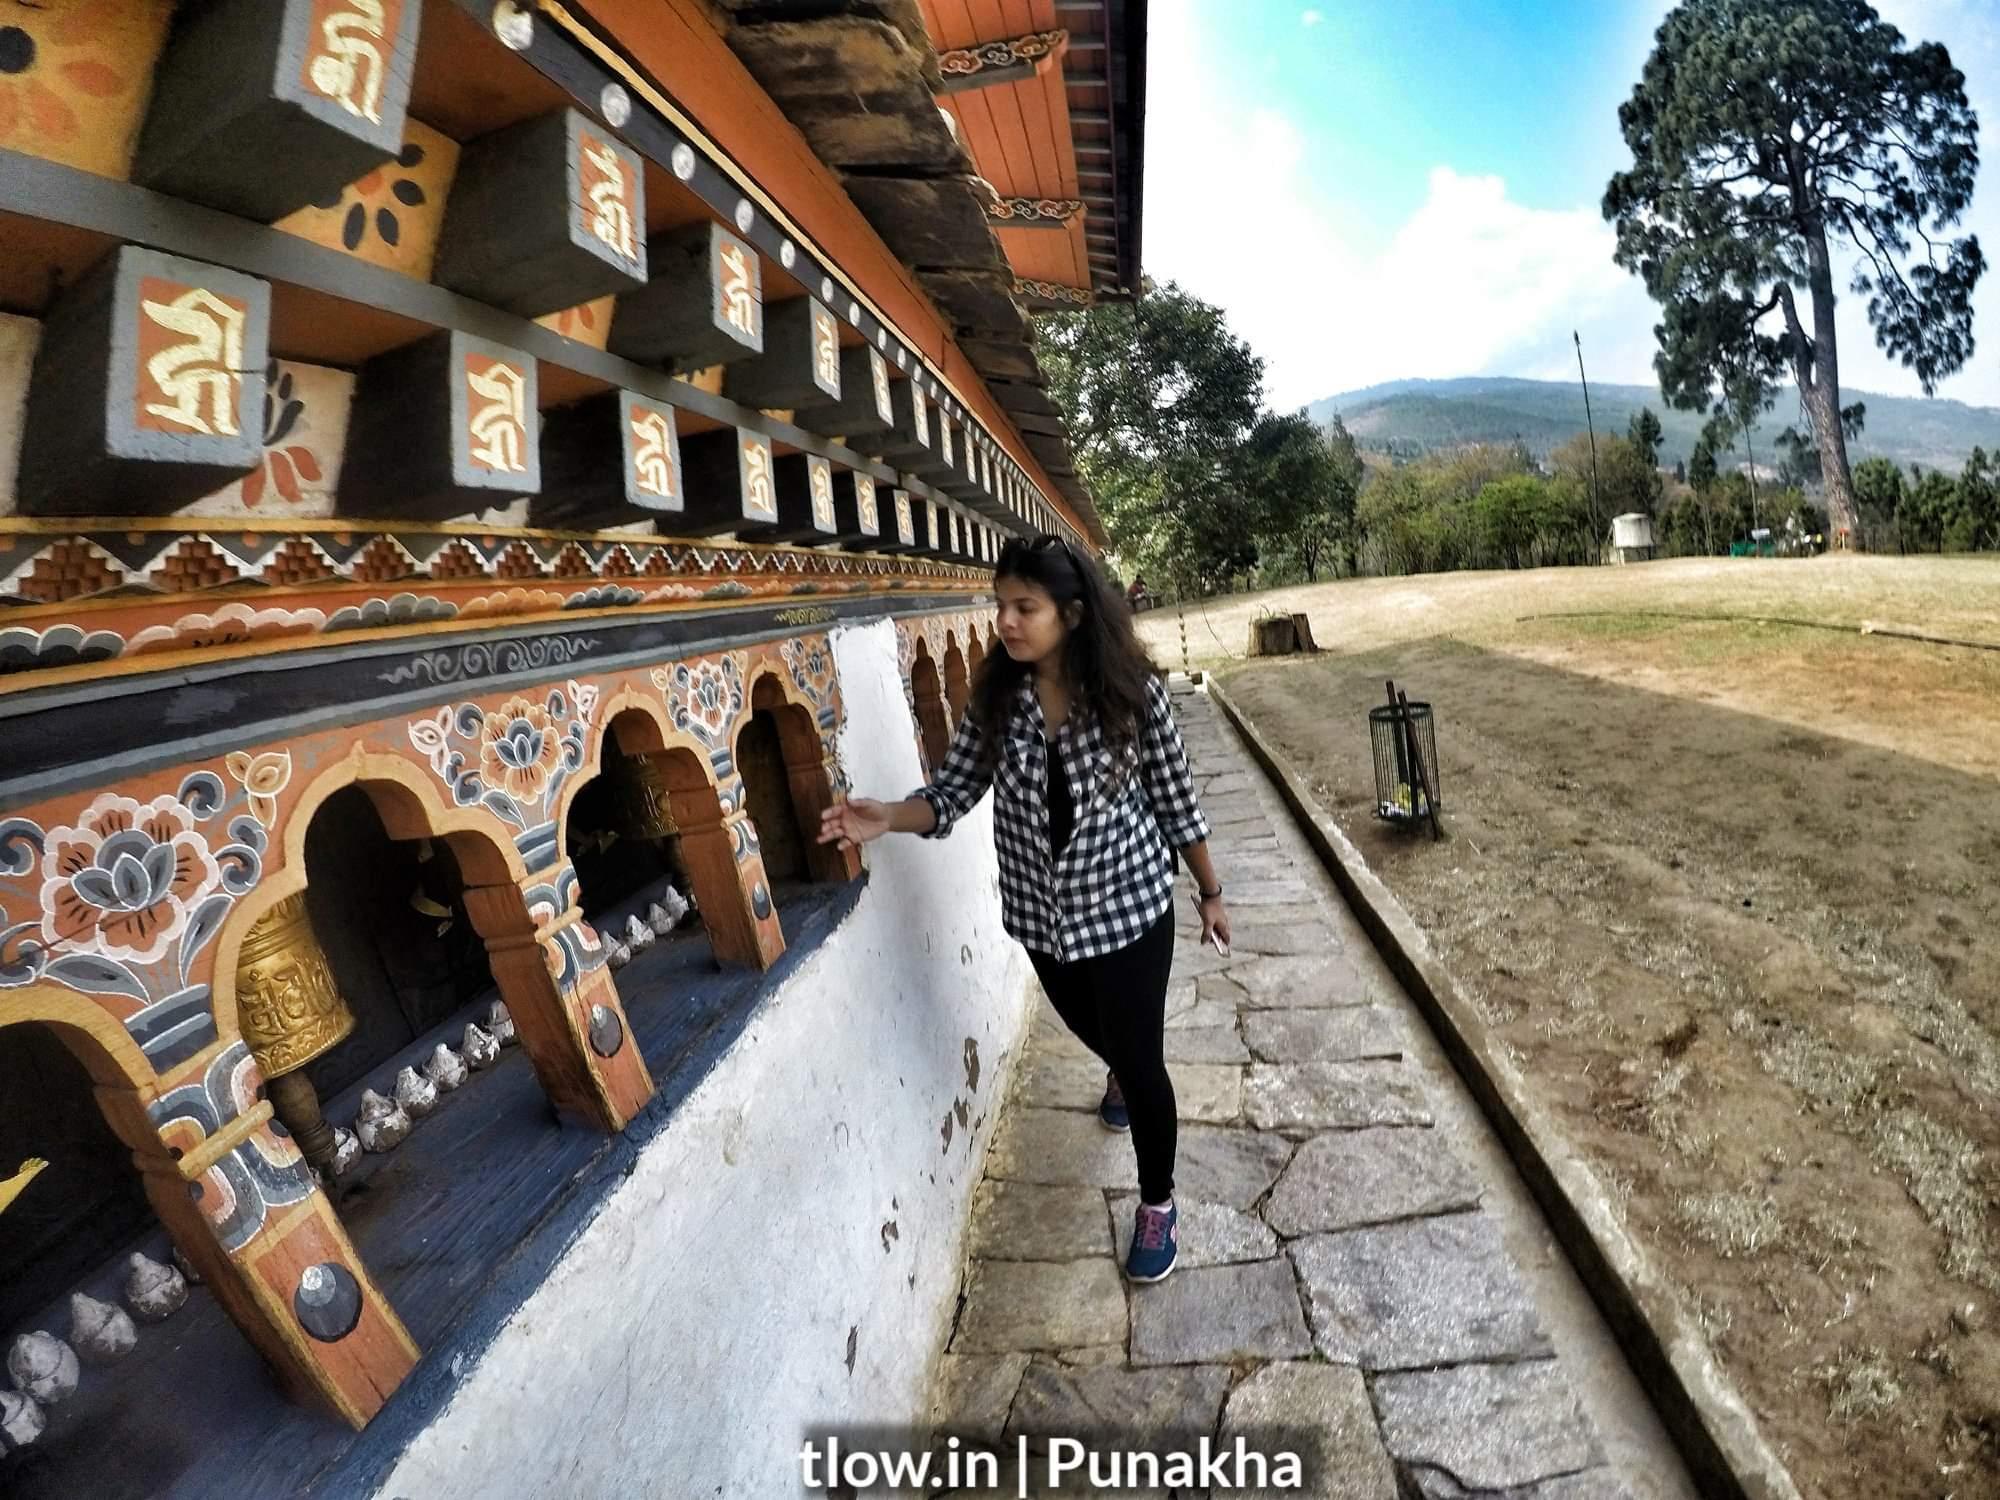 Prayer wheels in Punakha